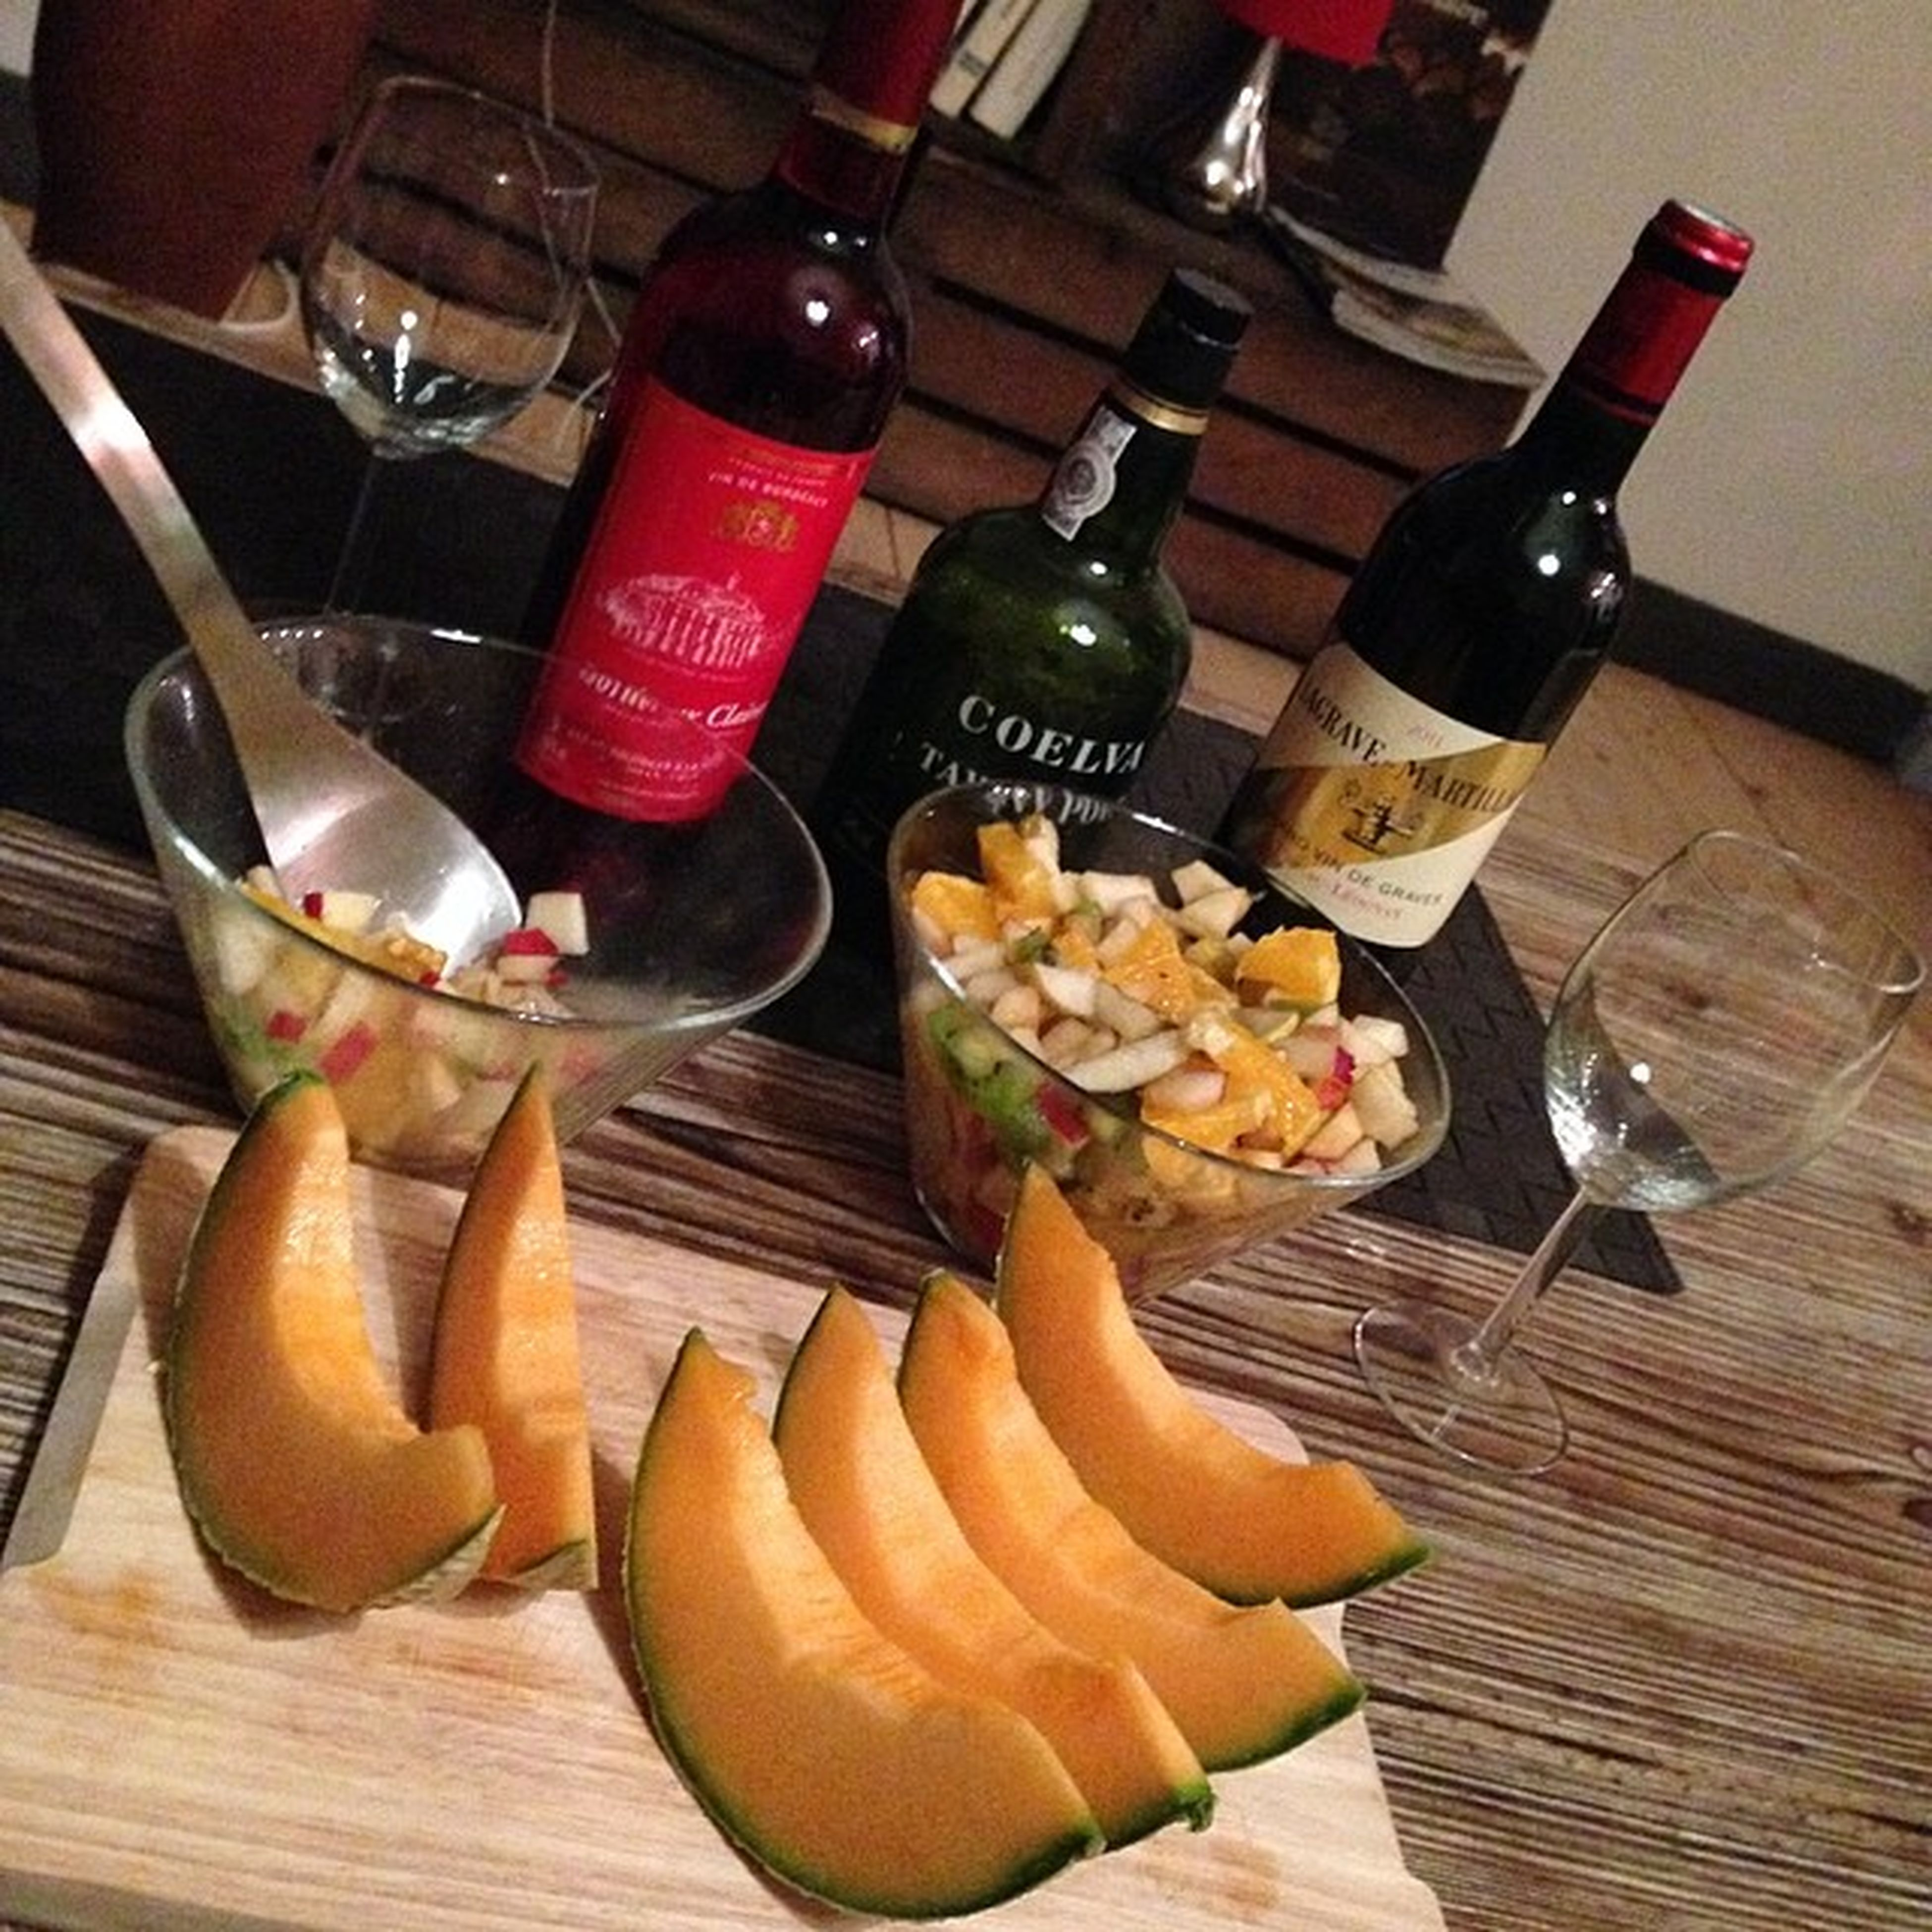 Soirée Appart Ramene Ta bouteillepessacleognanclairetmodedegustationactiver @tipoua @kwatuve